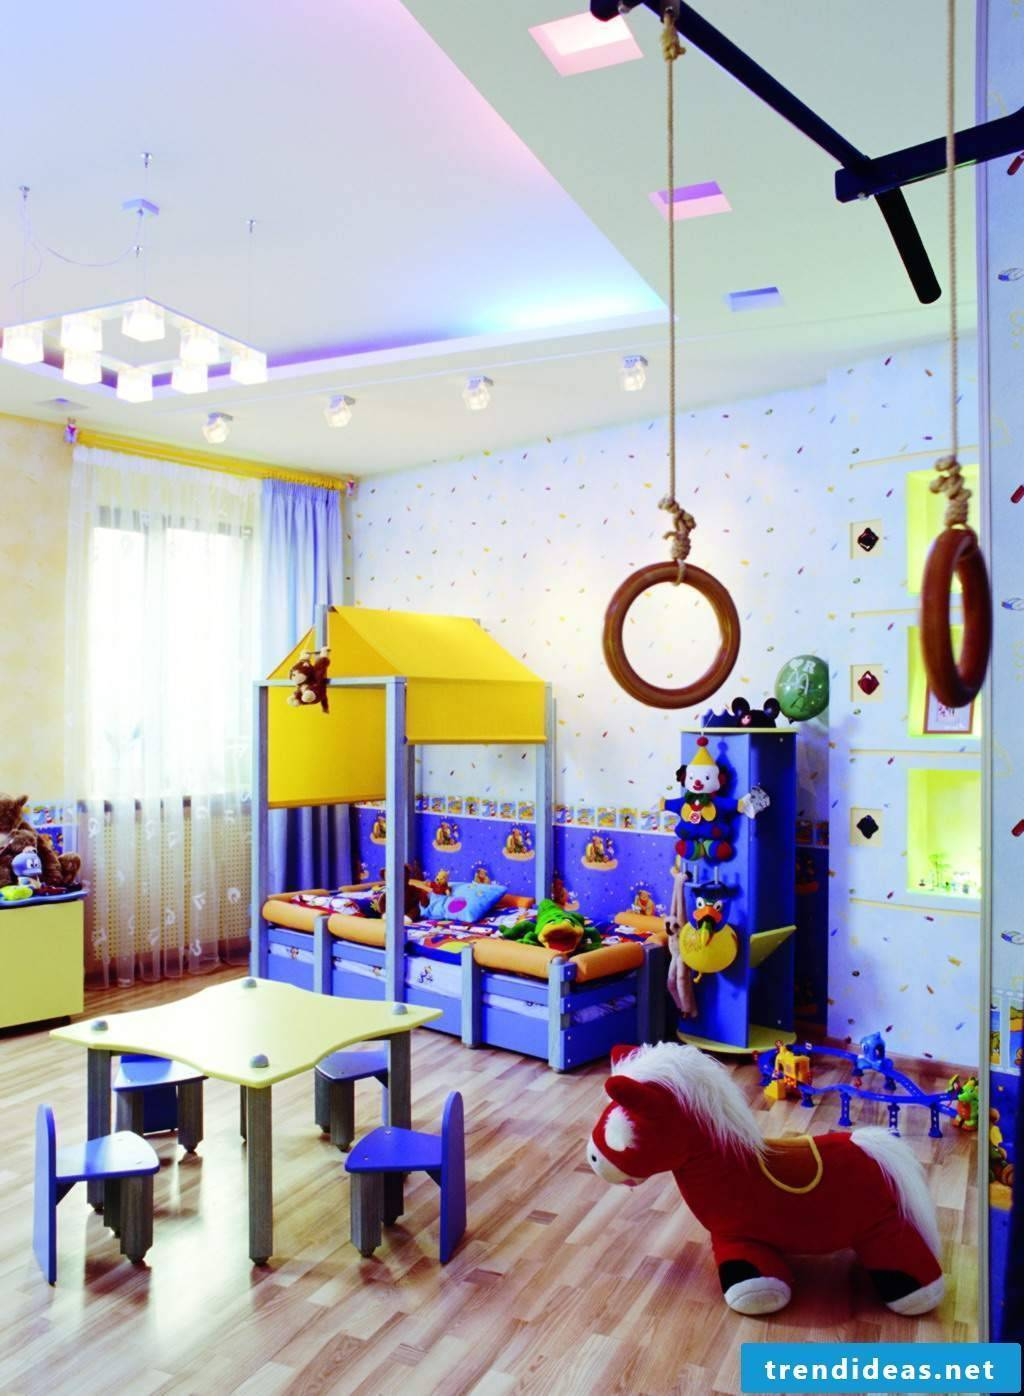 Nursery design for little boy